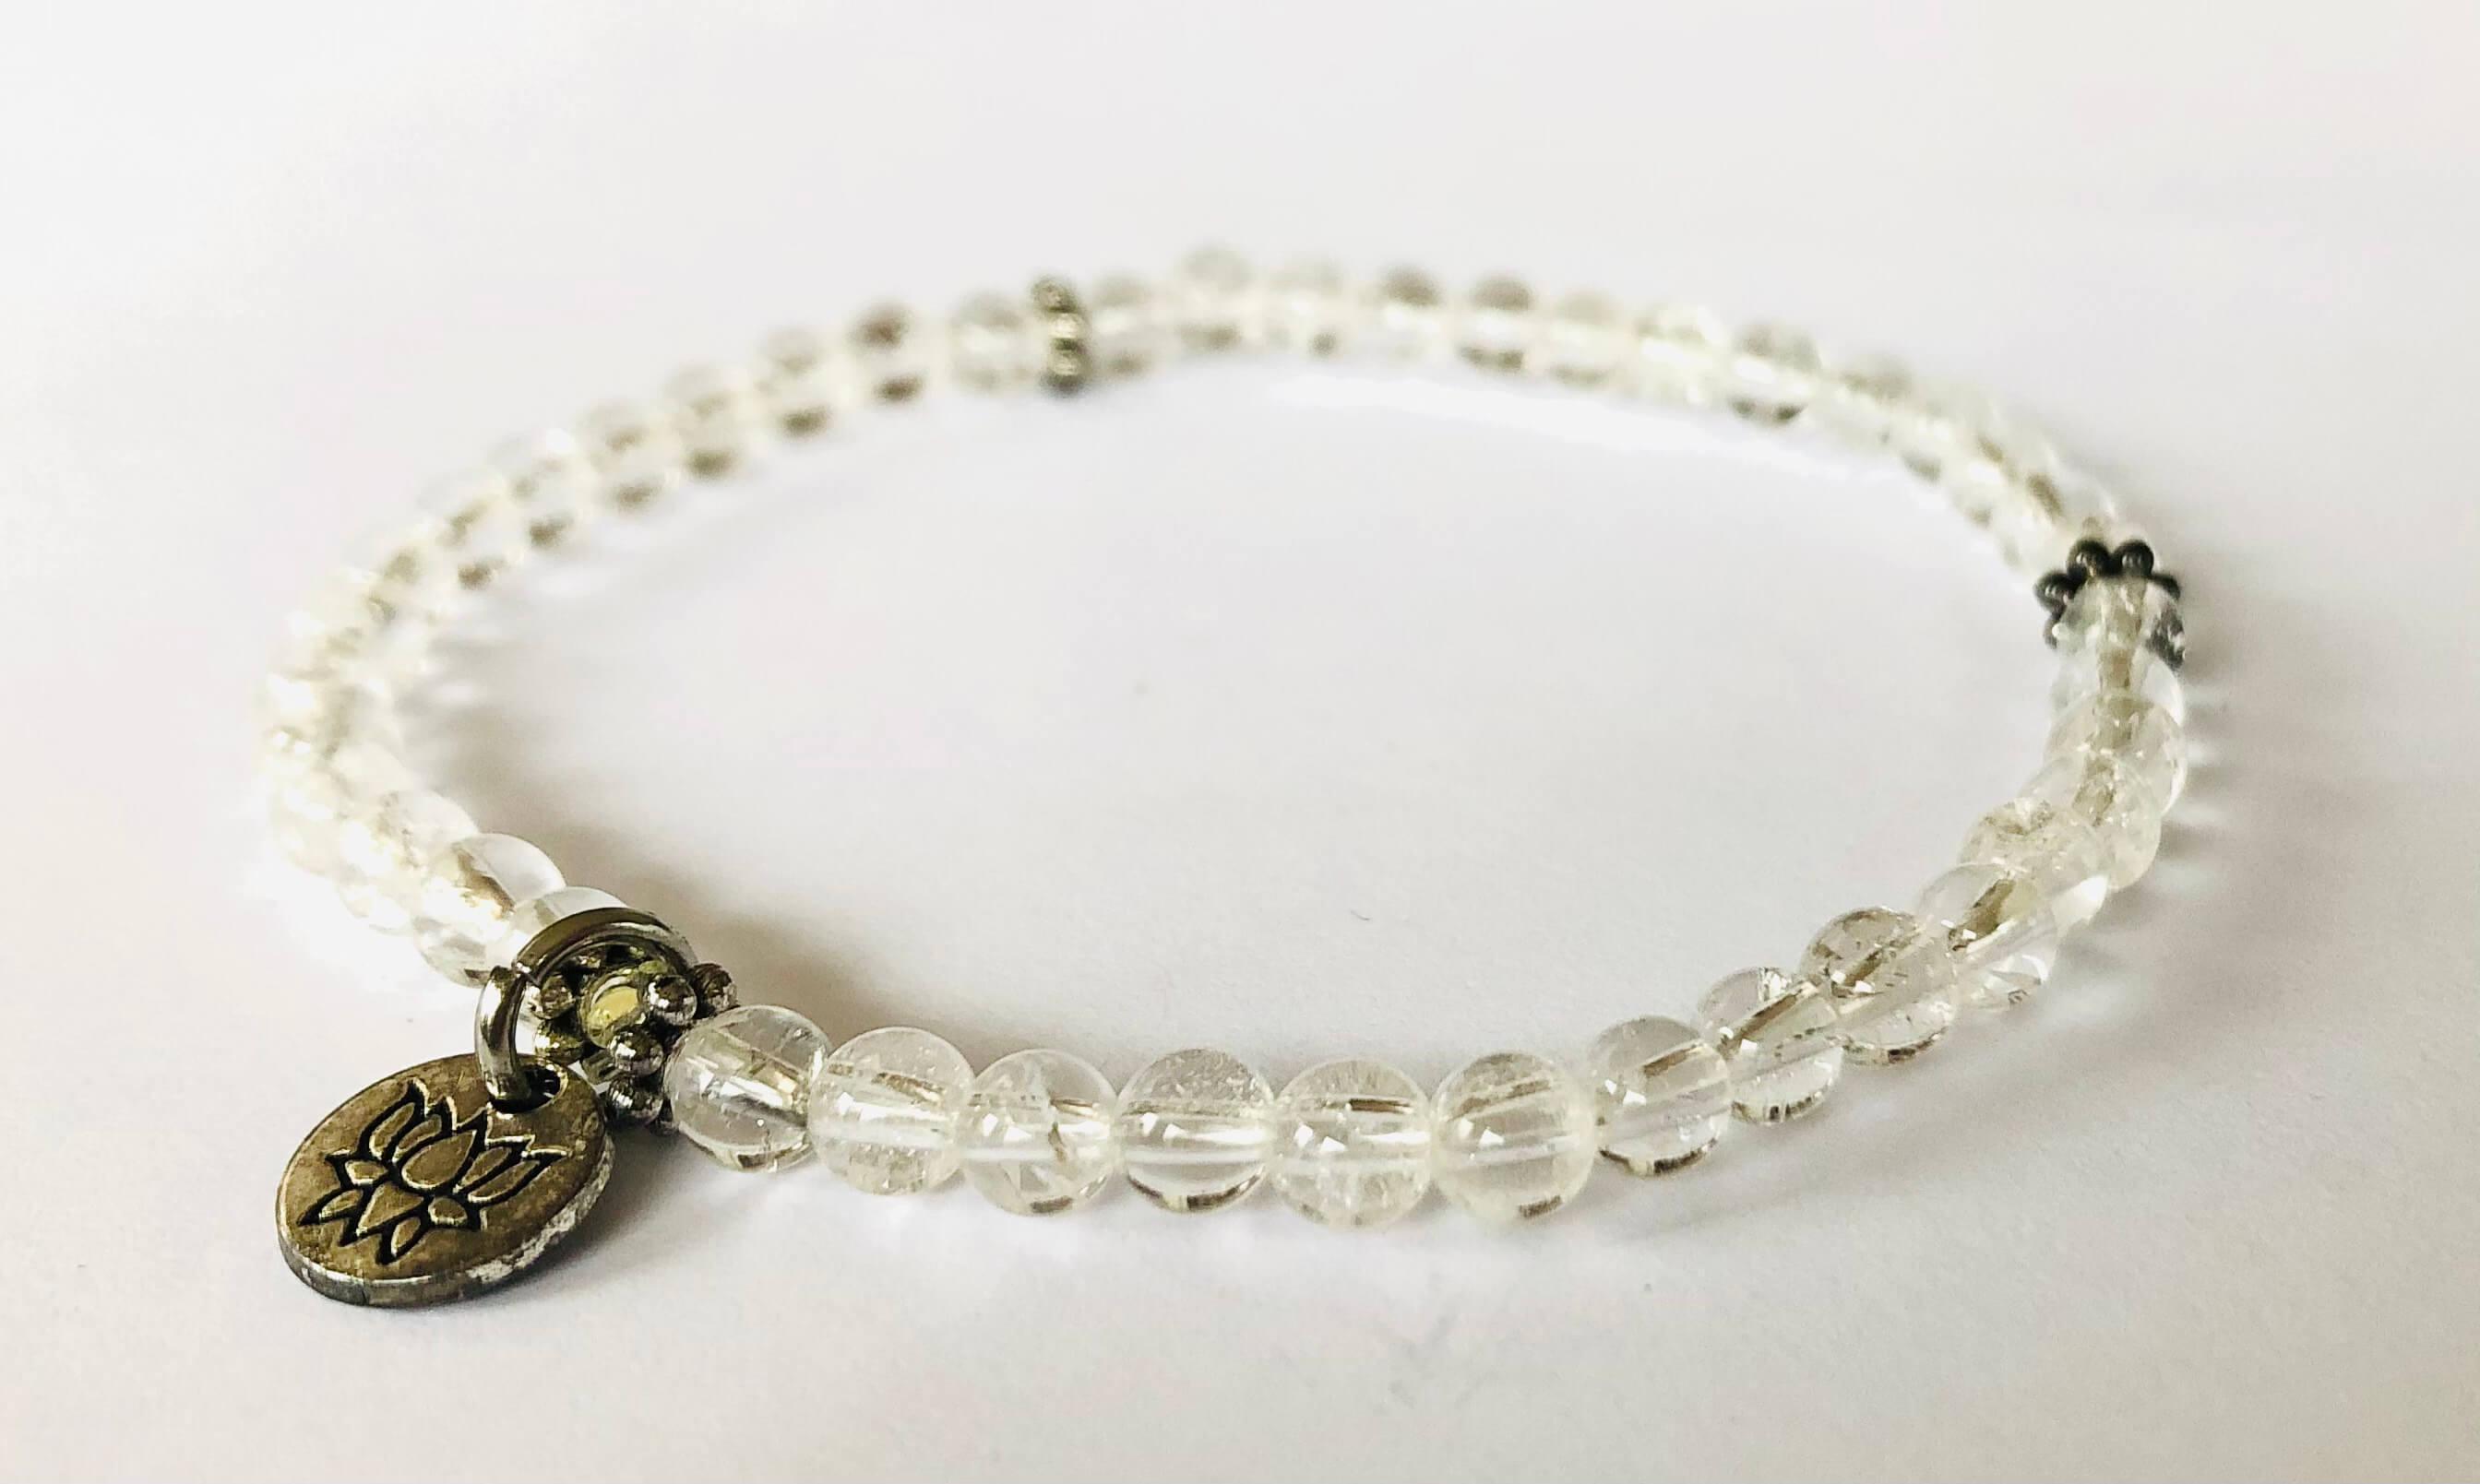 Bergkristall Armband